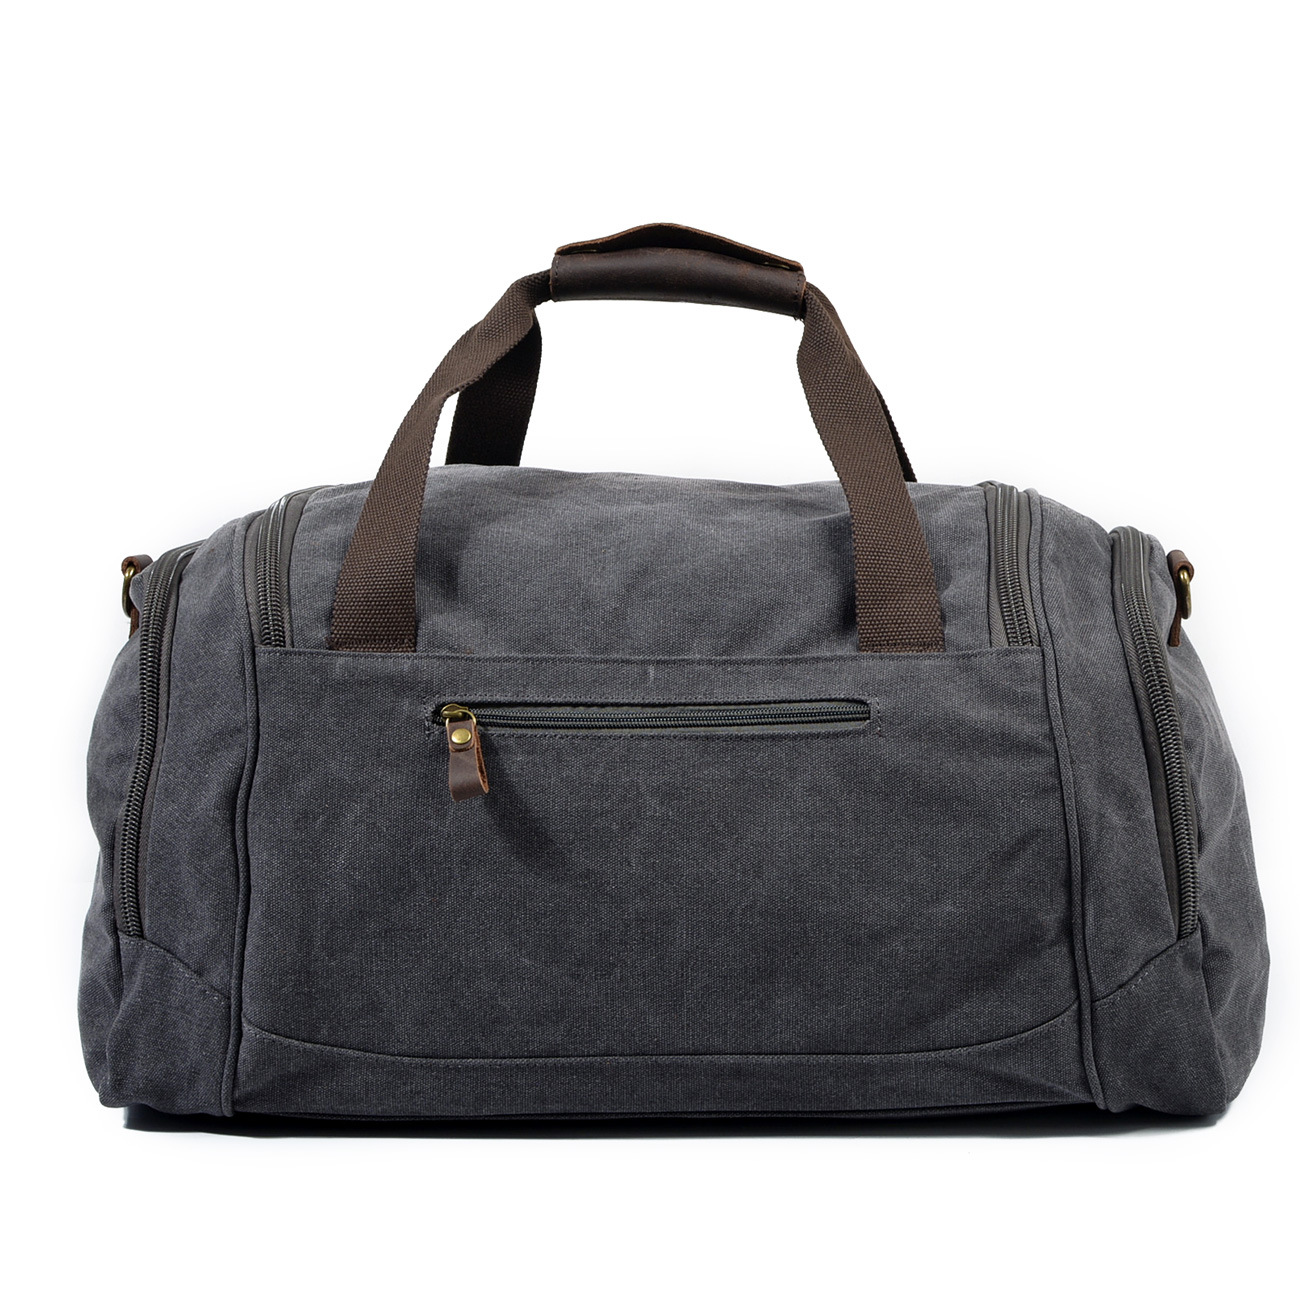 Waterproof Duffel Bag Men Canvas Carry Weekender Bag Vintage Military Shoulder Handbag Leather Travel Tote Large Overnight Bag